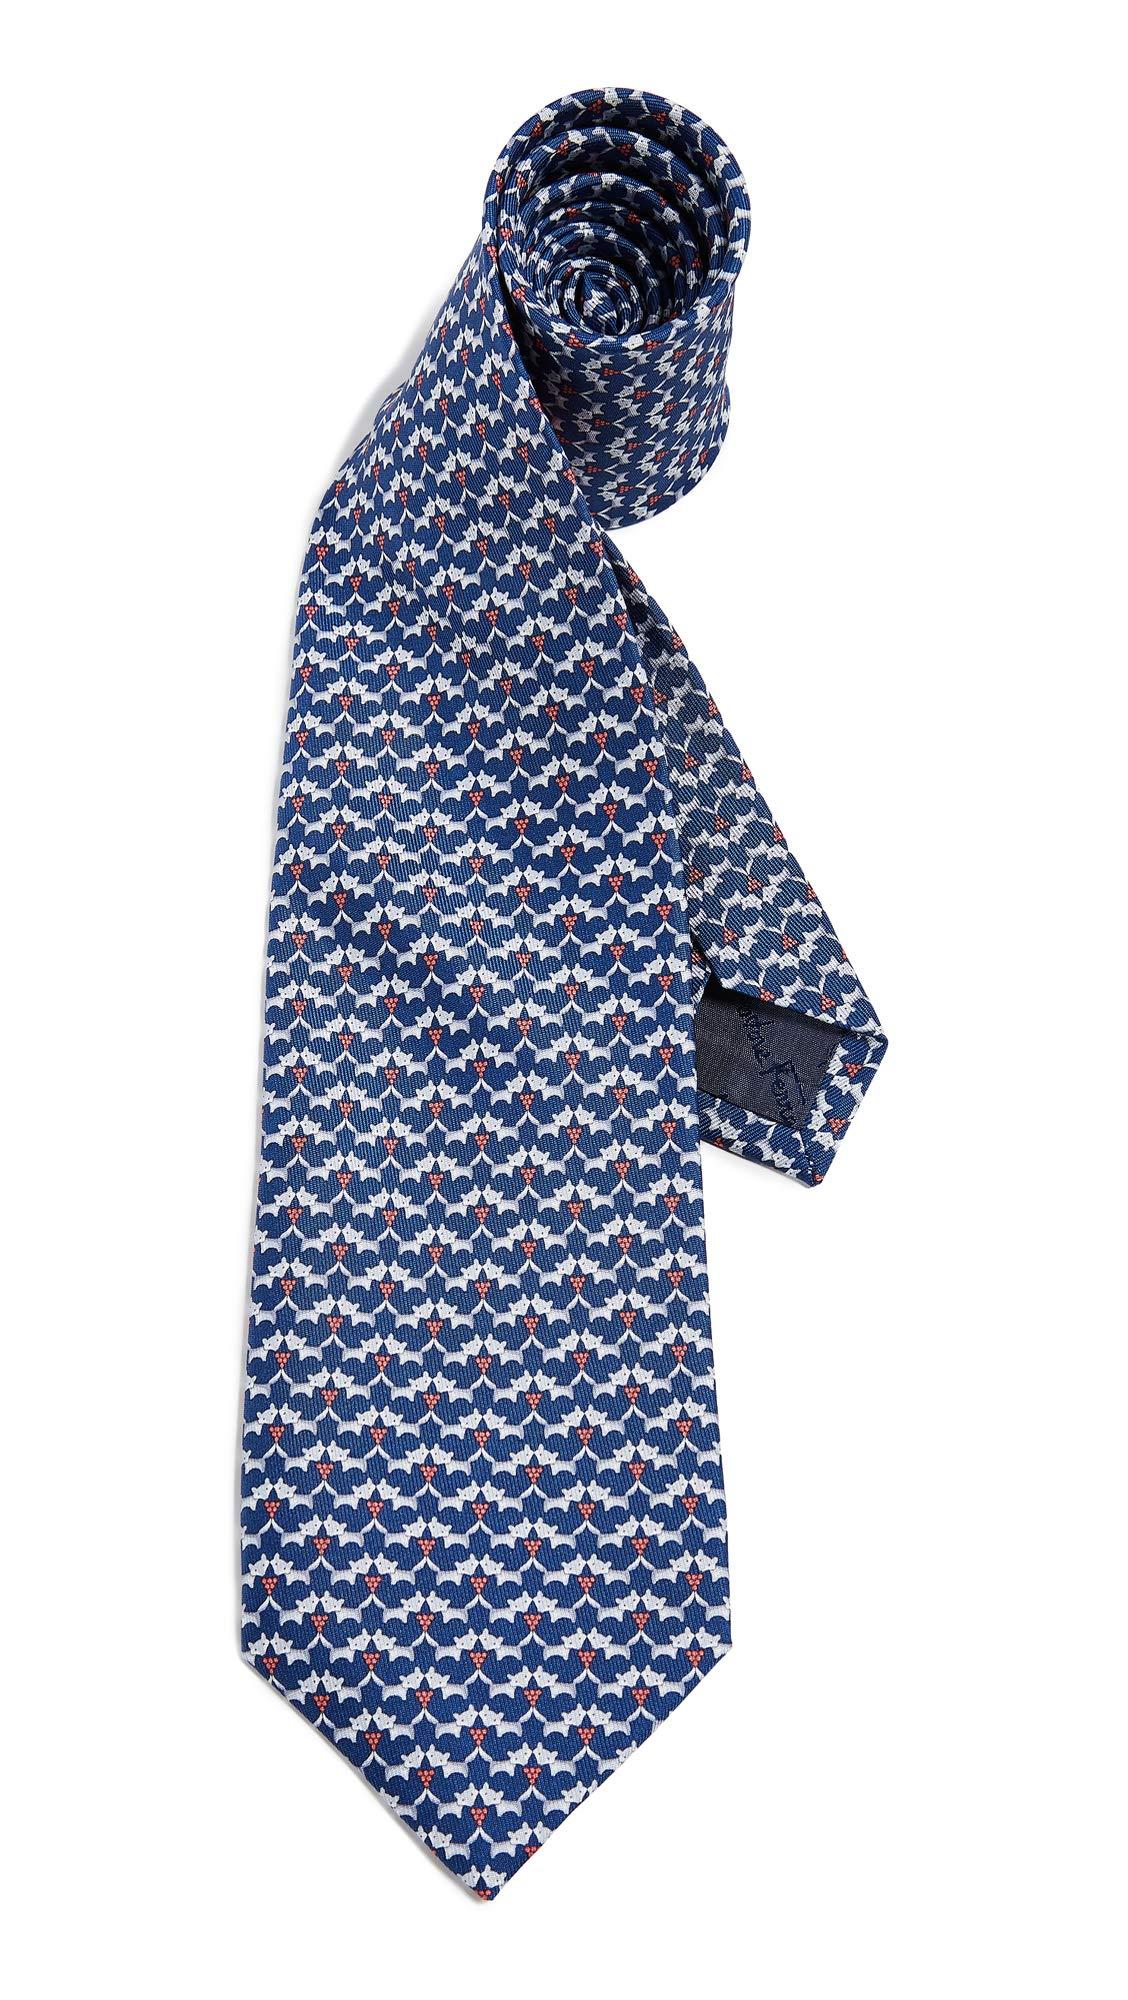 Salvatore Ferragamo Men's Fox Tie, Navy, Blue, Print, One Size